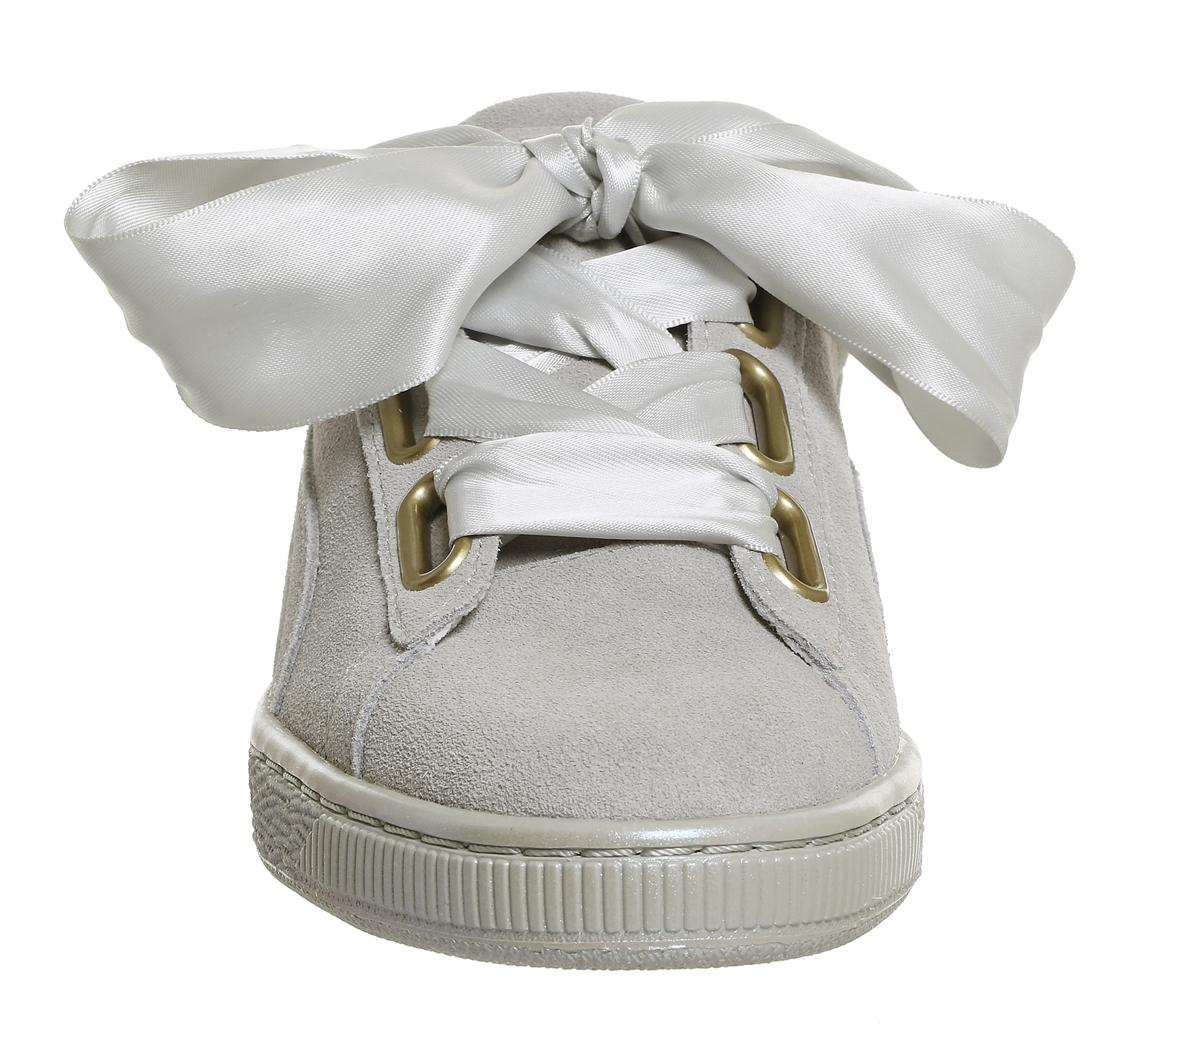 finest selection 88040 3f4dd Chaussures-Femme-Puma-Daim-Coeur-Gris-Violet-Satin-